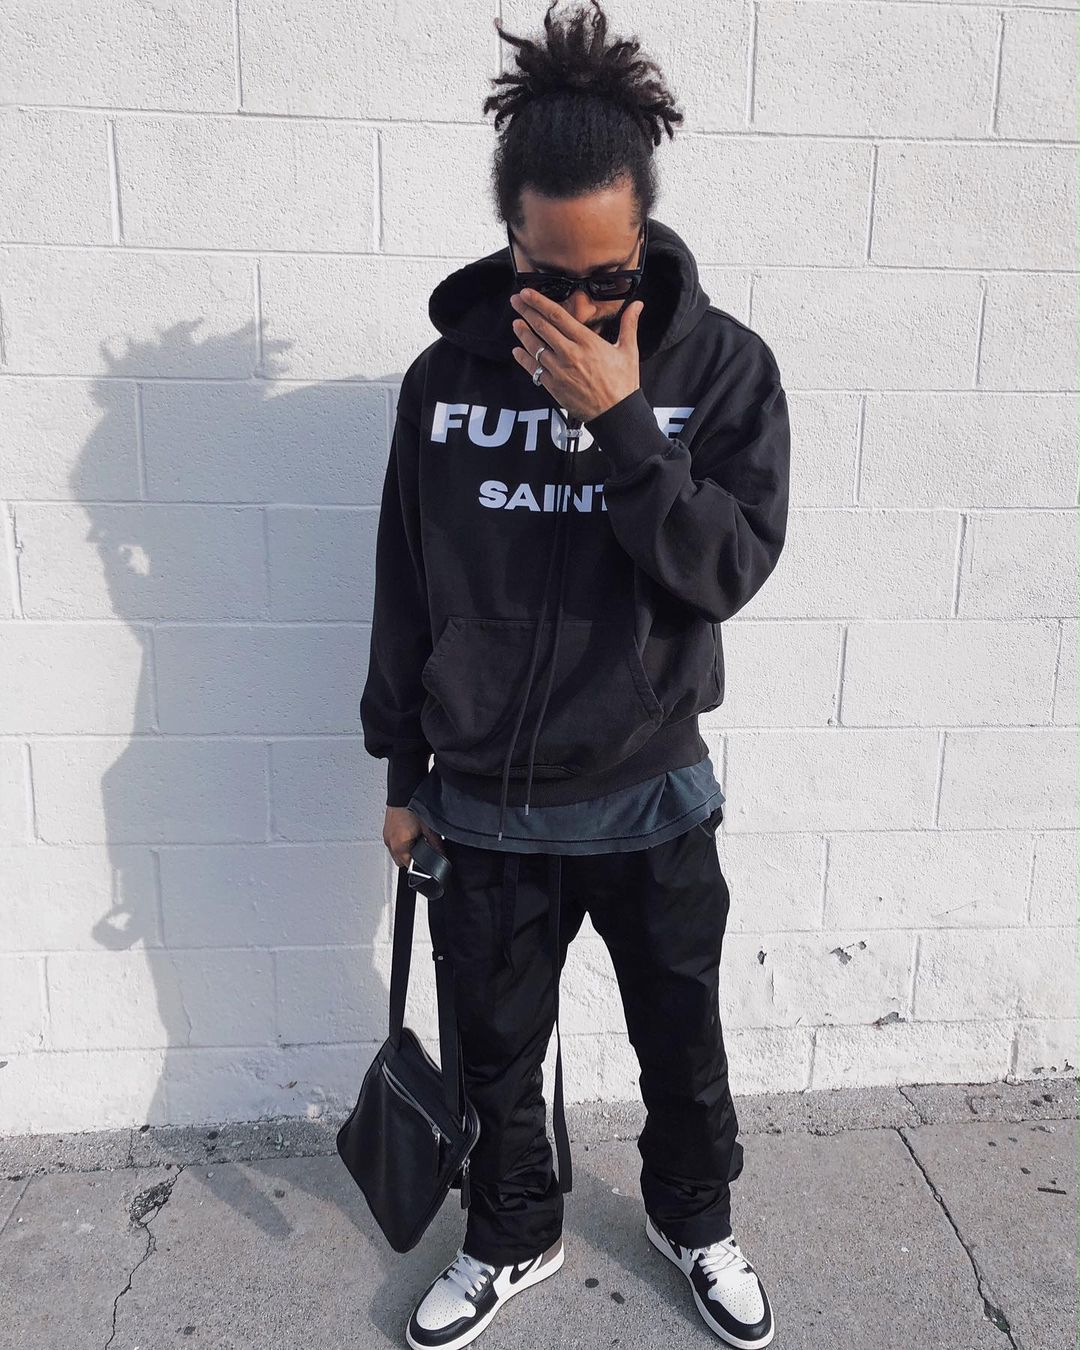 Future-Saint-clothing-brand